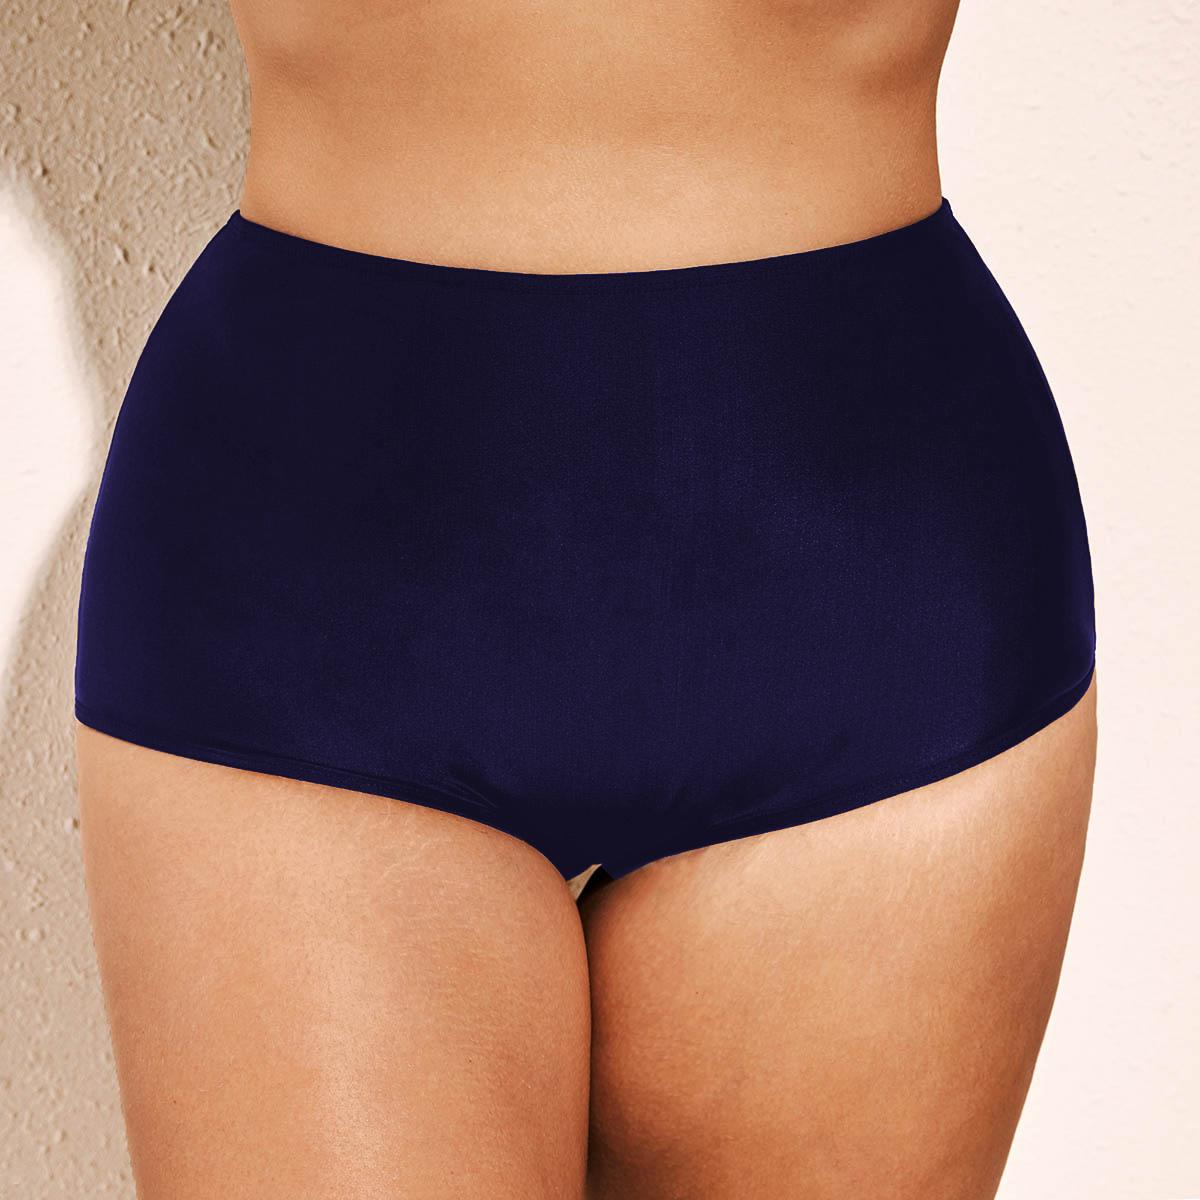 ROTITA Plus Size Navy Blue High Waist Swimwear Panty